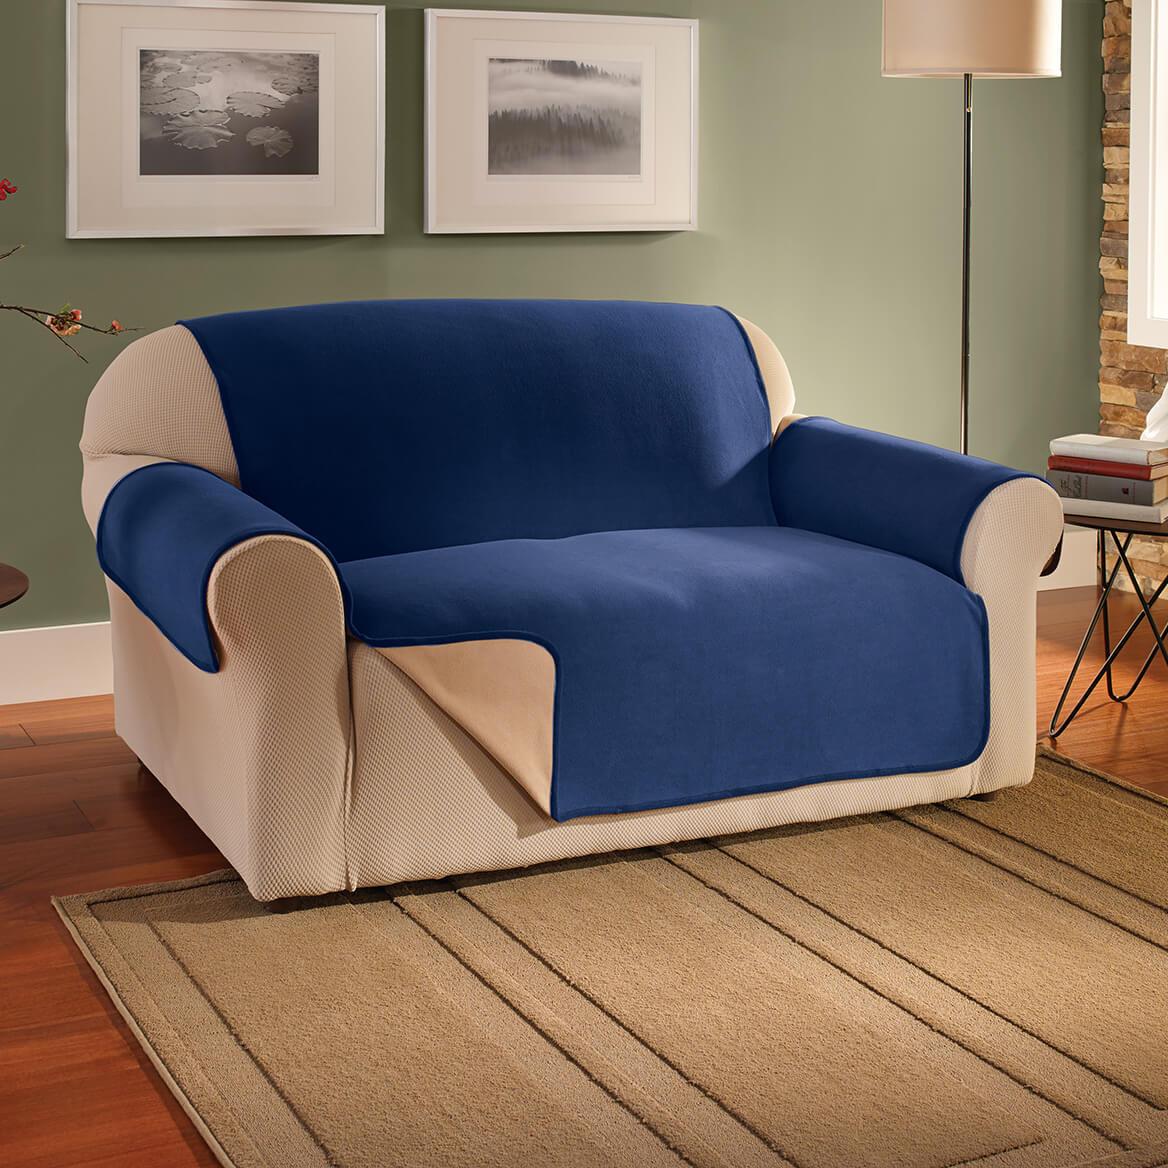 Reverse Waterproof Sofa Protector-365476